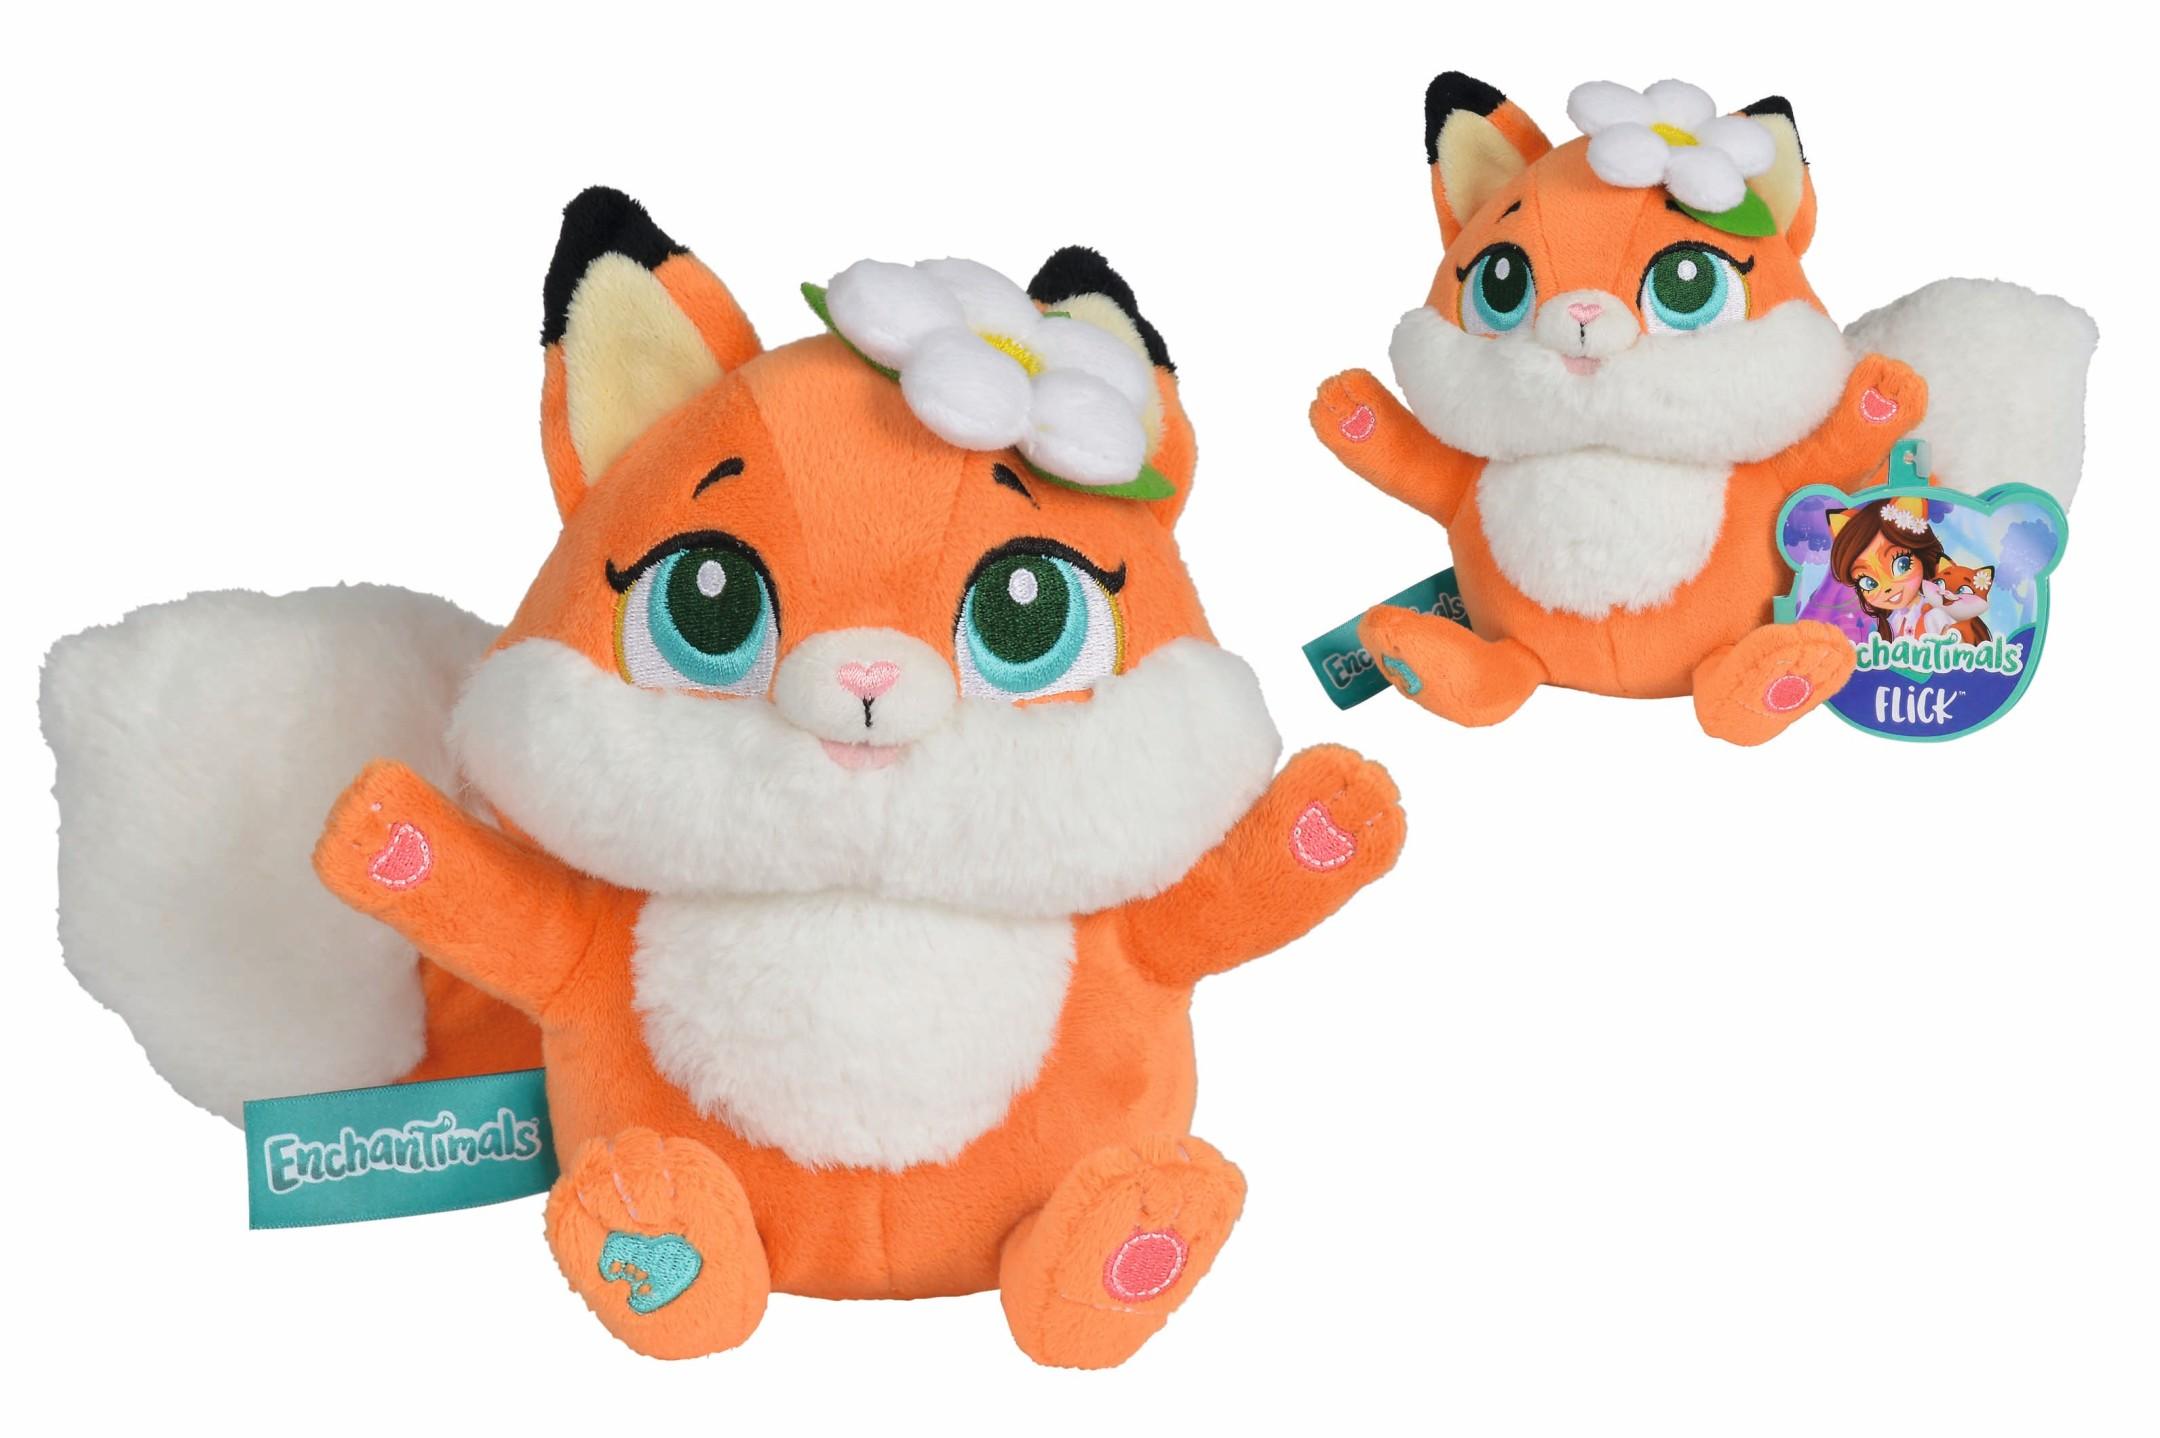 Enchantimals Fox Flick 35cm